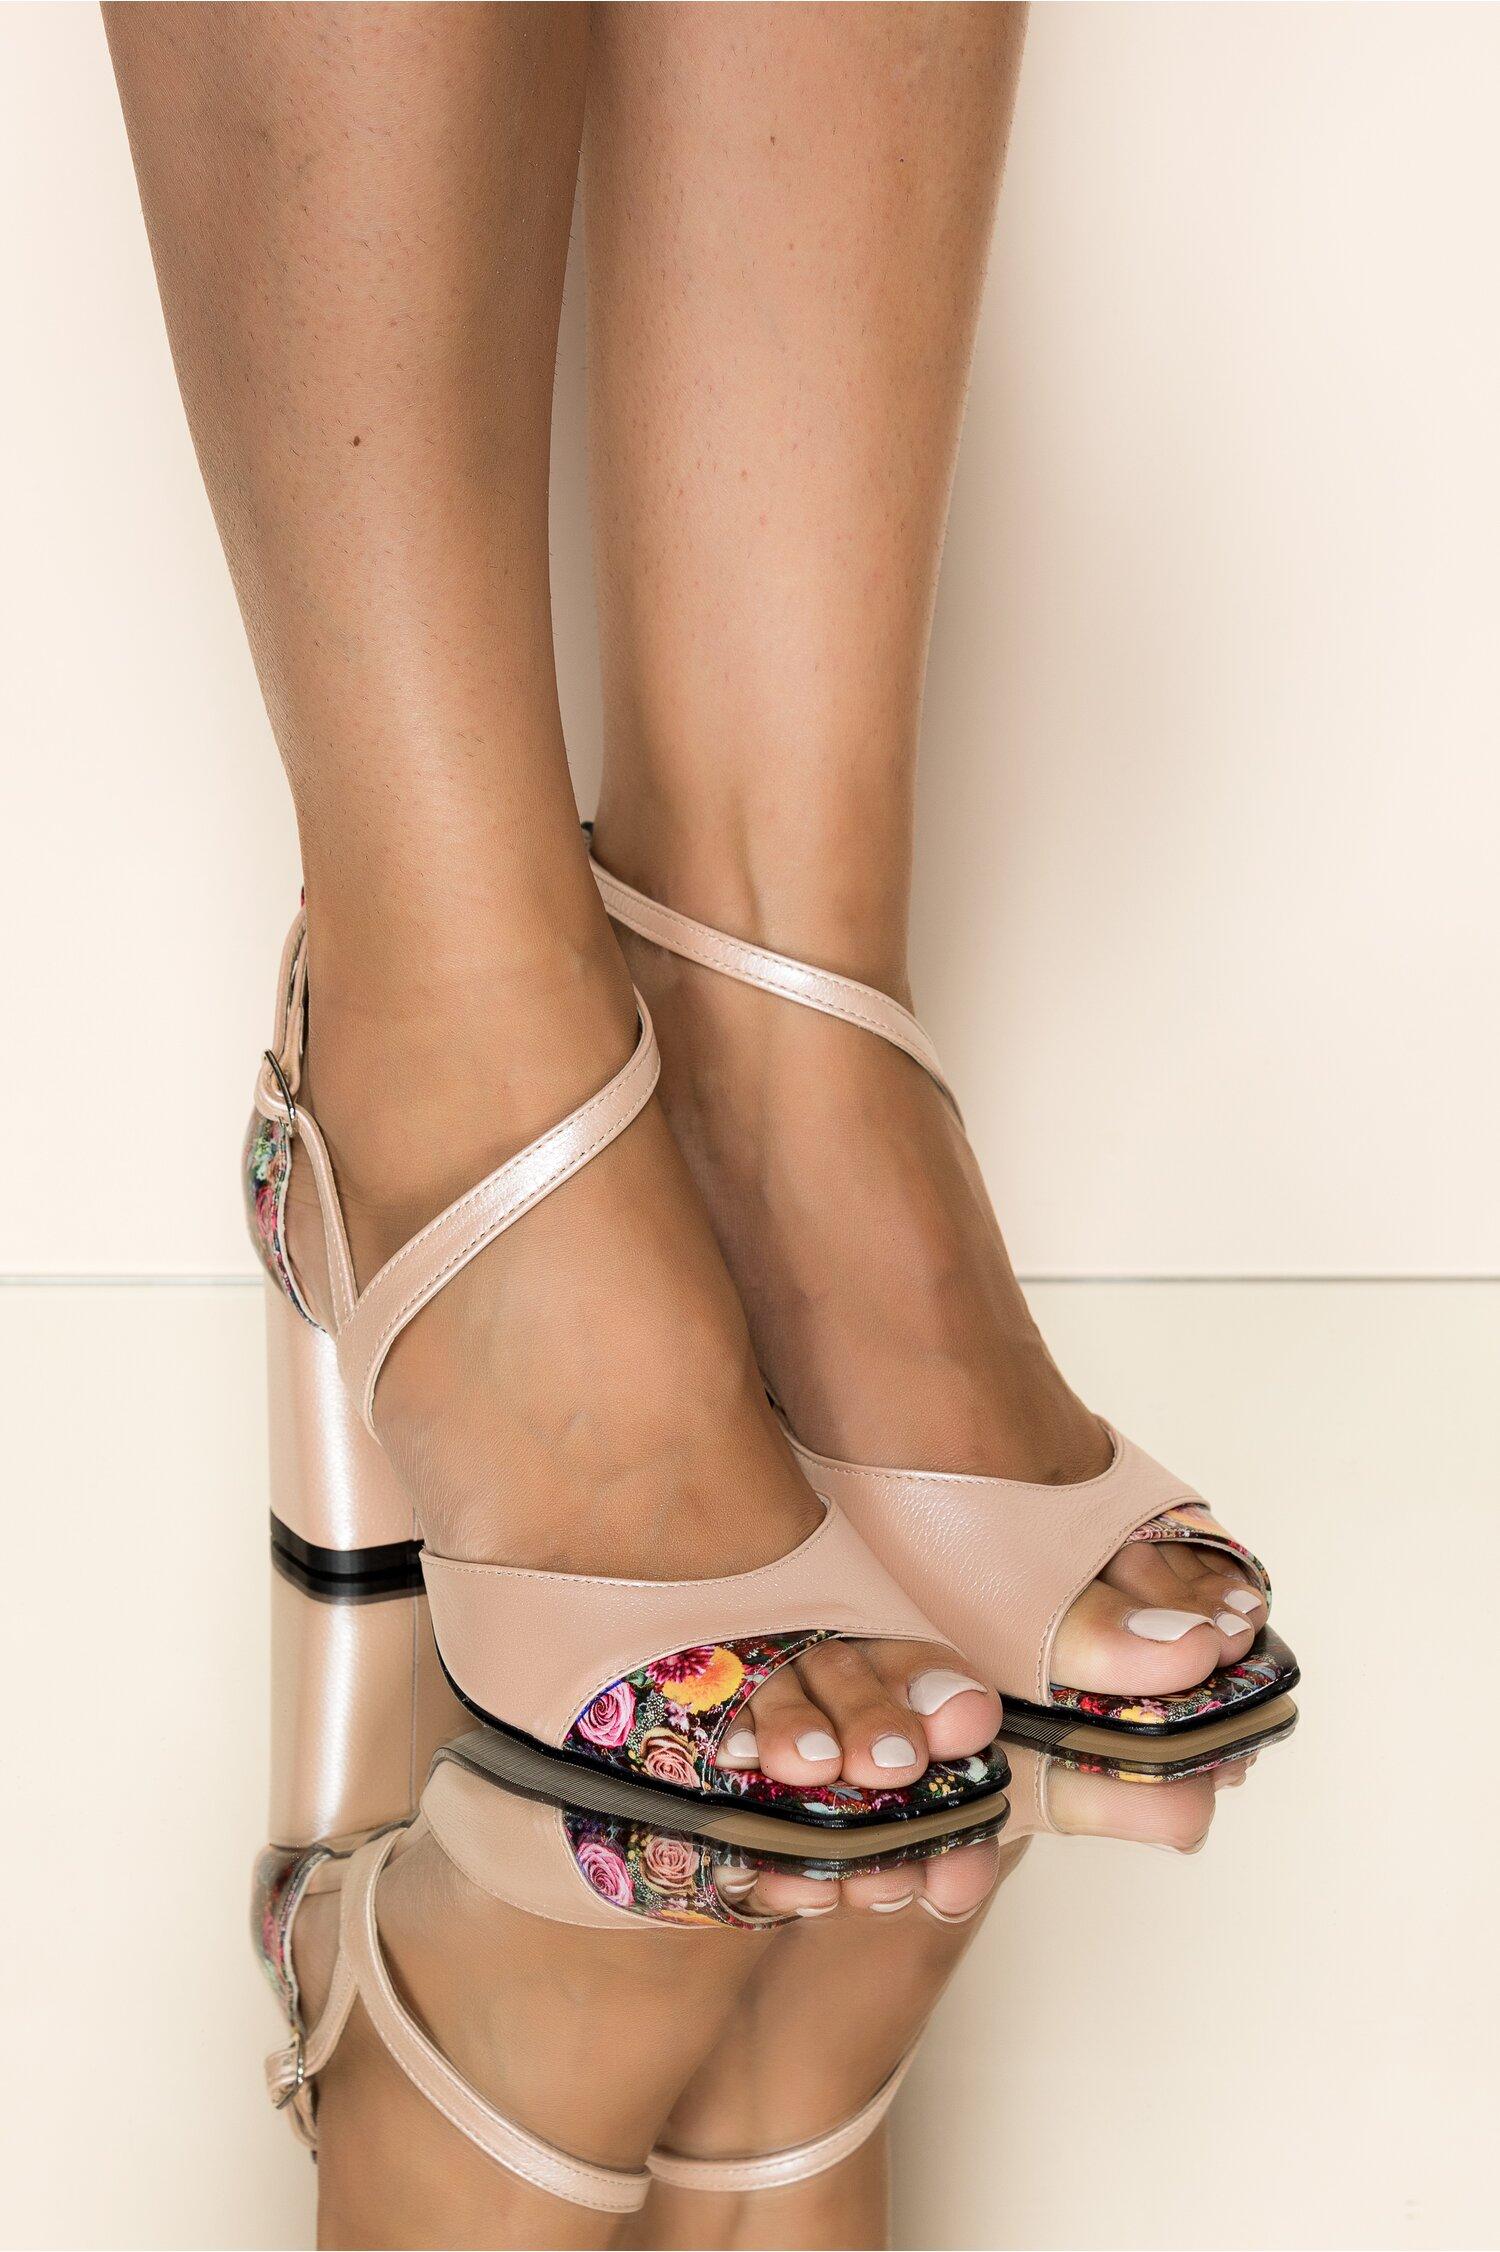 Sandale din piele naturala roz deschis cu imprimeu floral